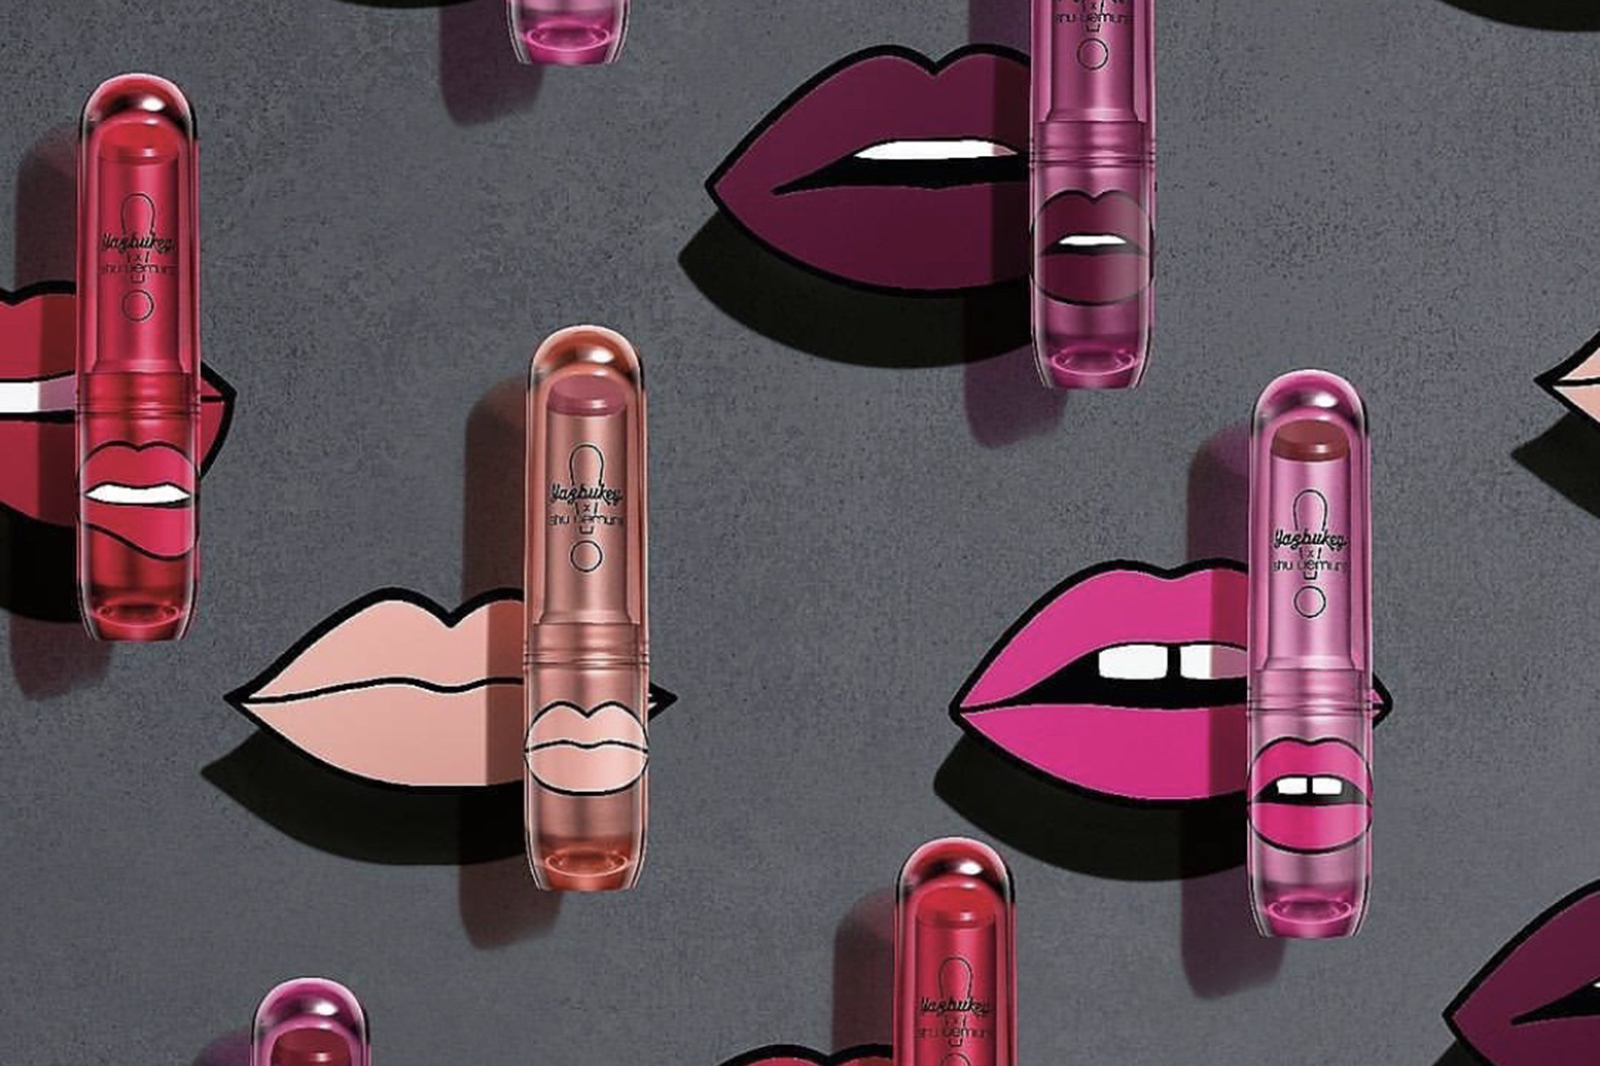 shu uemura yuzbukey matte lipstick spring printemps 2018